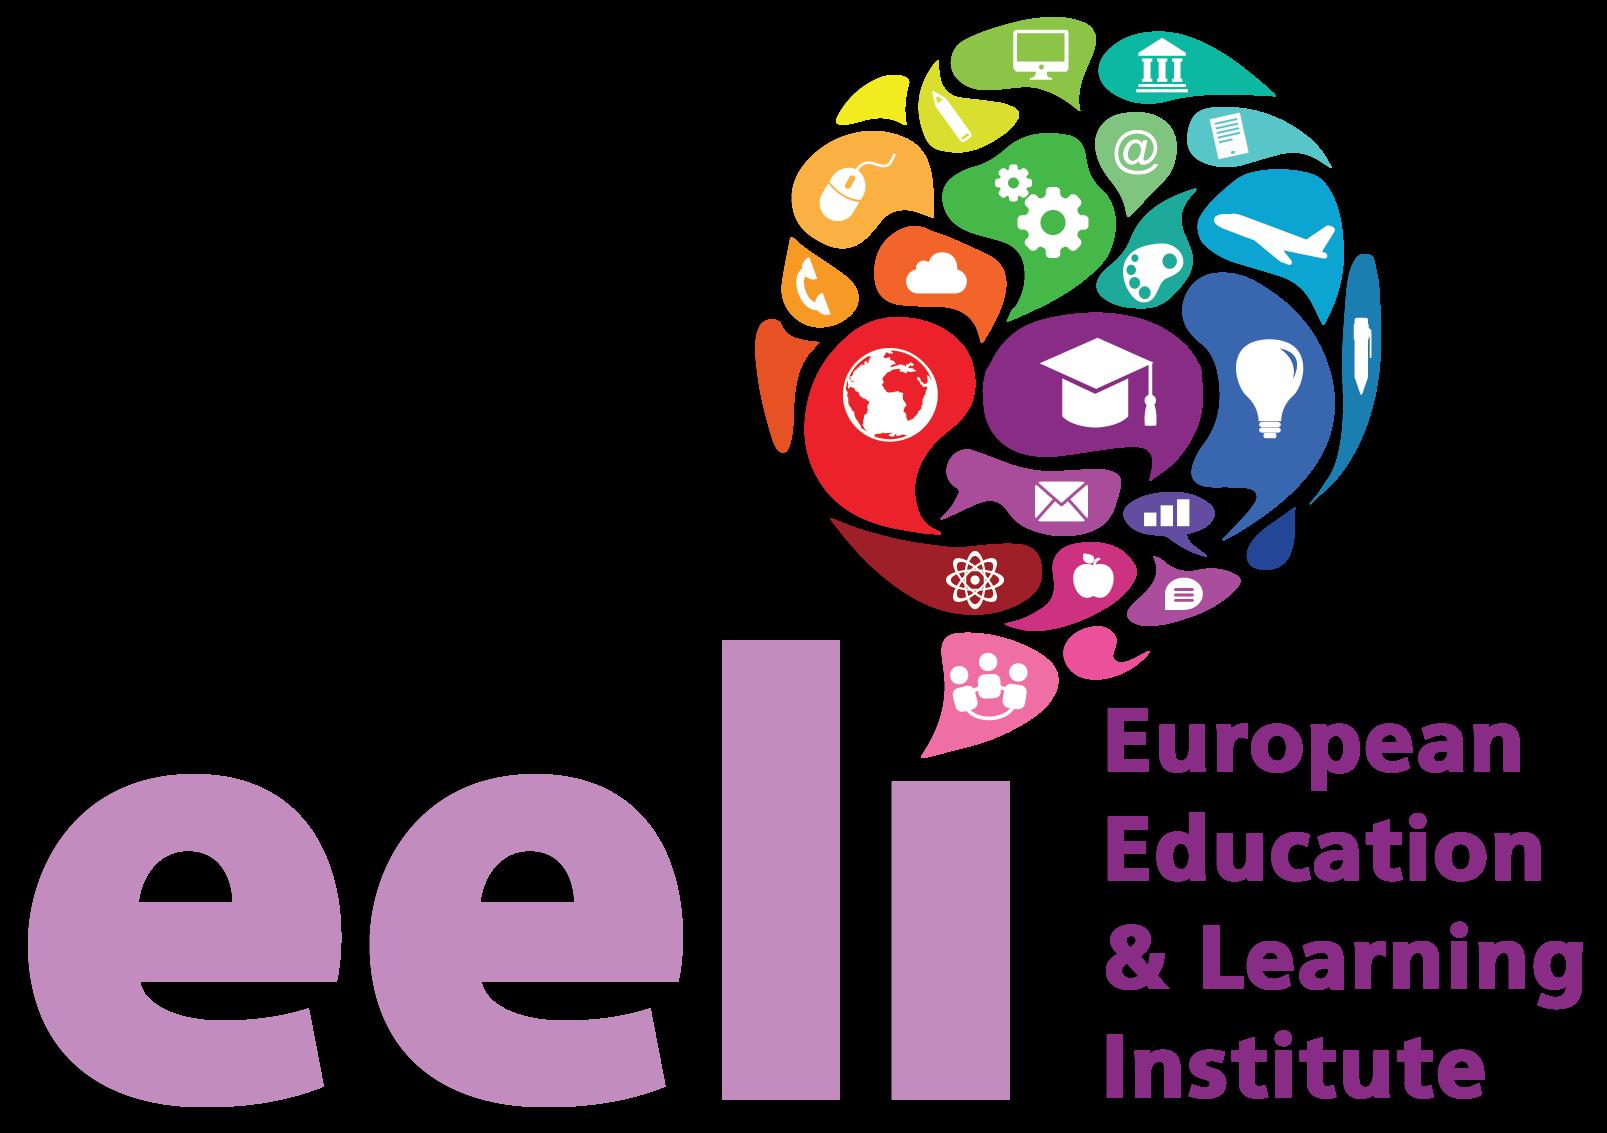 EUROPEAN EDUCATION & LEARNING INSTITUTE